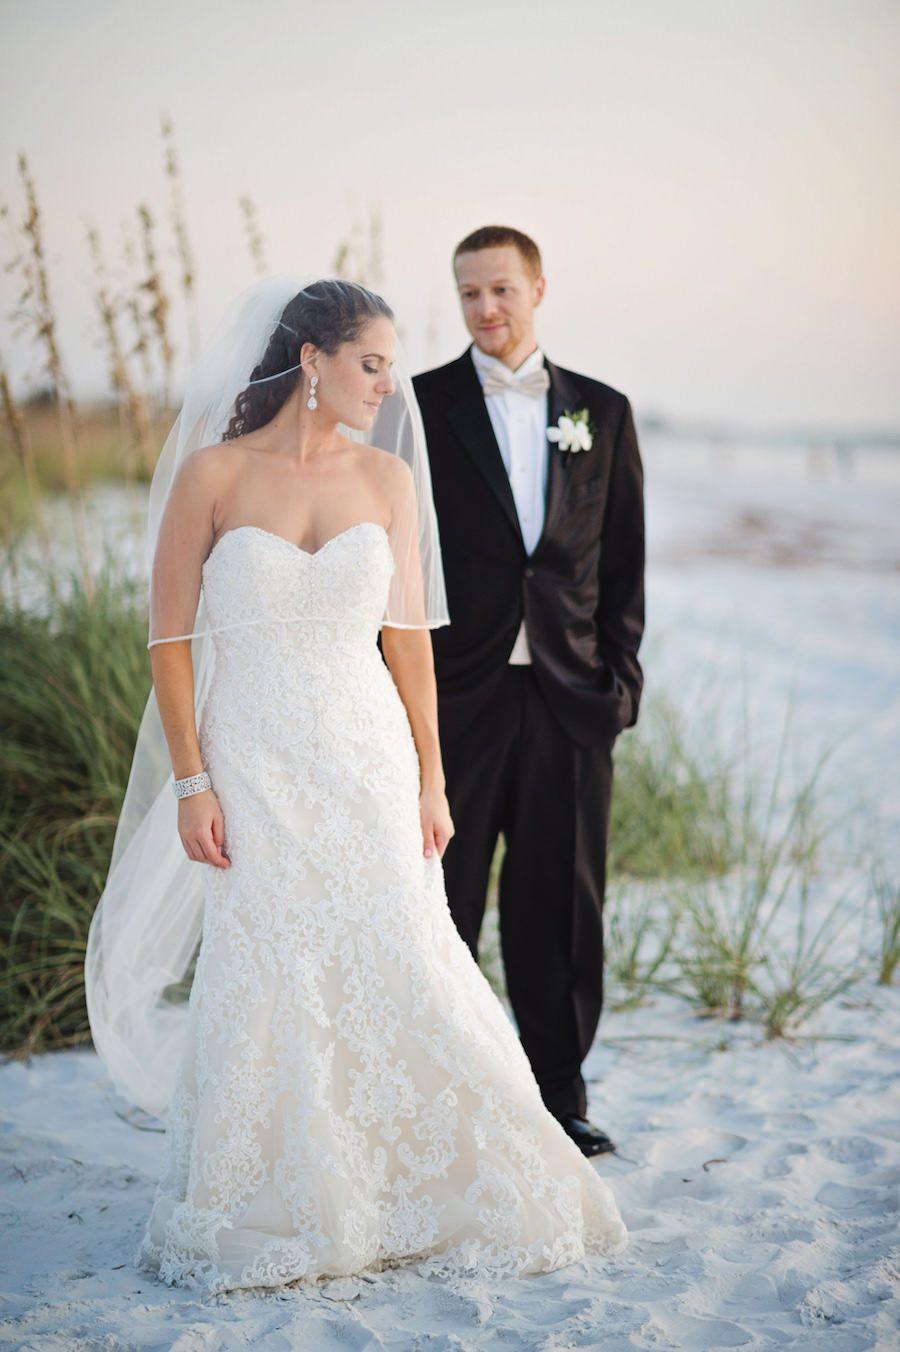 Beach wedding looks for bride  Beach Bride and Groom Wedding Portrait  Tampa Wedding Photographer